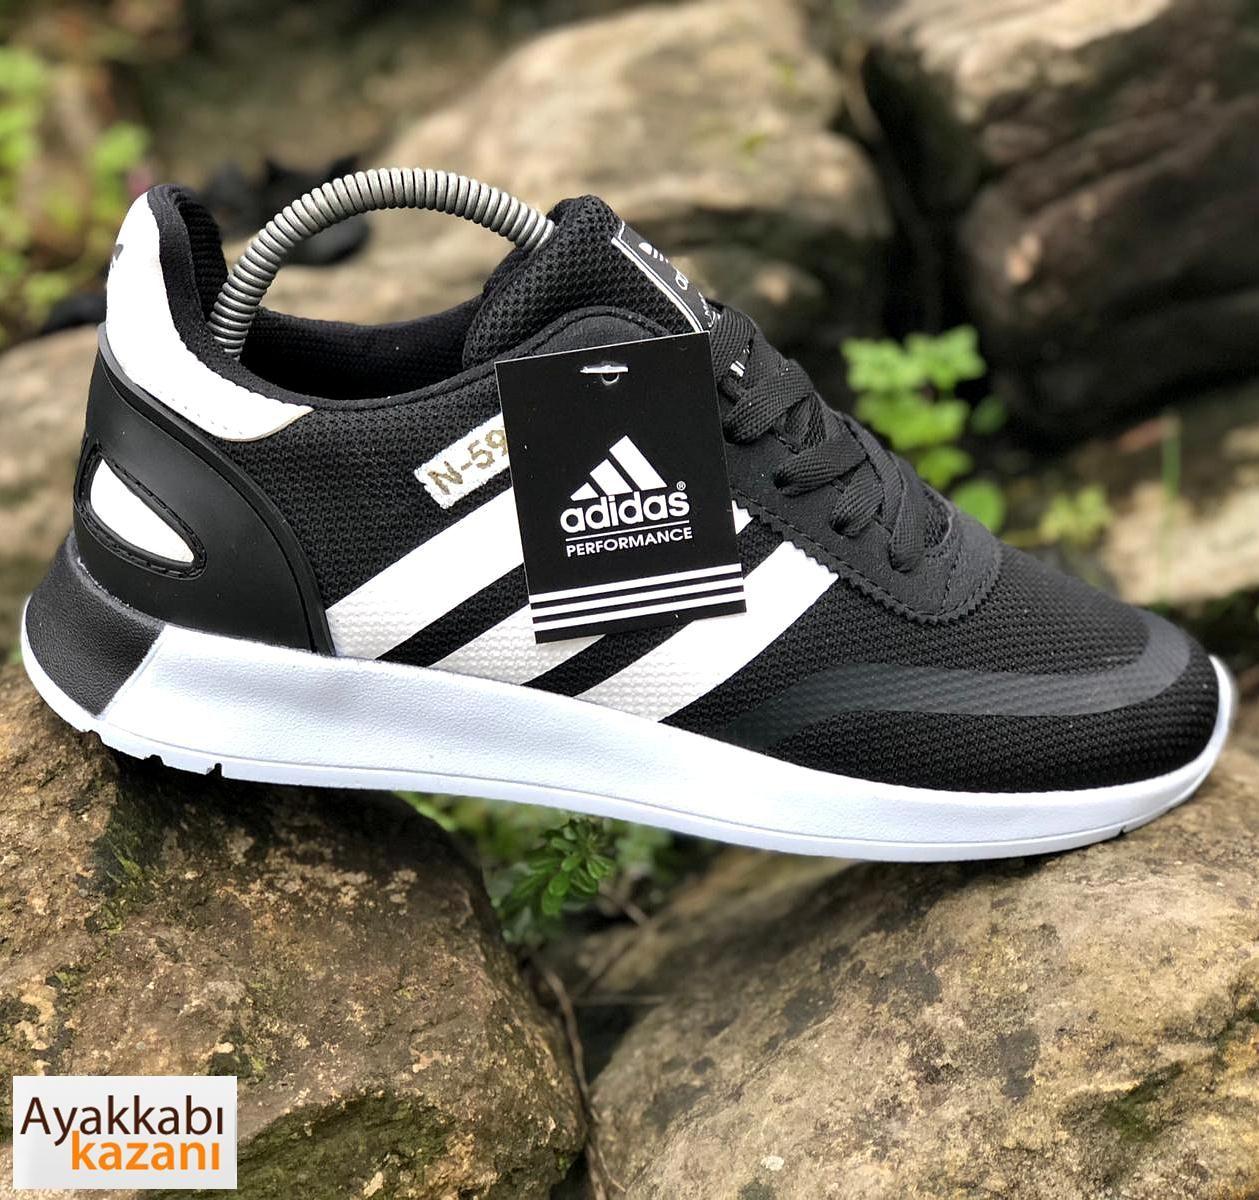 Images Orjinal Abb171a9e9476327337235f92eb57b46 Jpg Ayakkabilar Adidas Nike